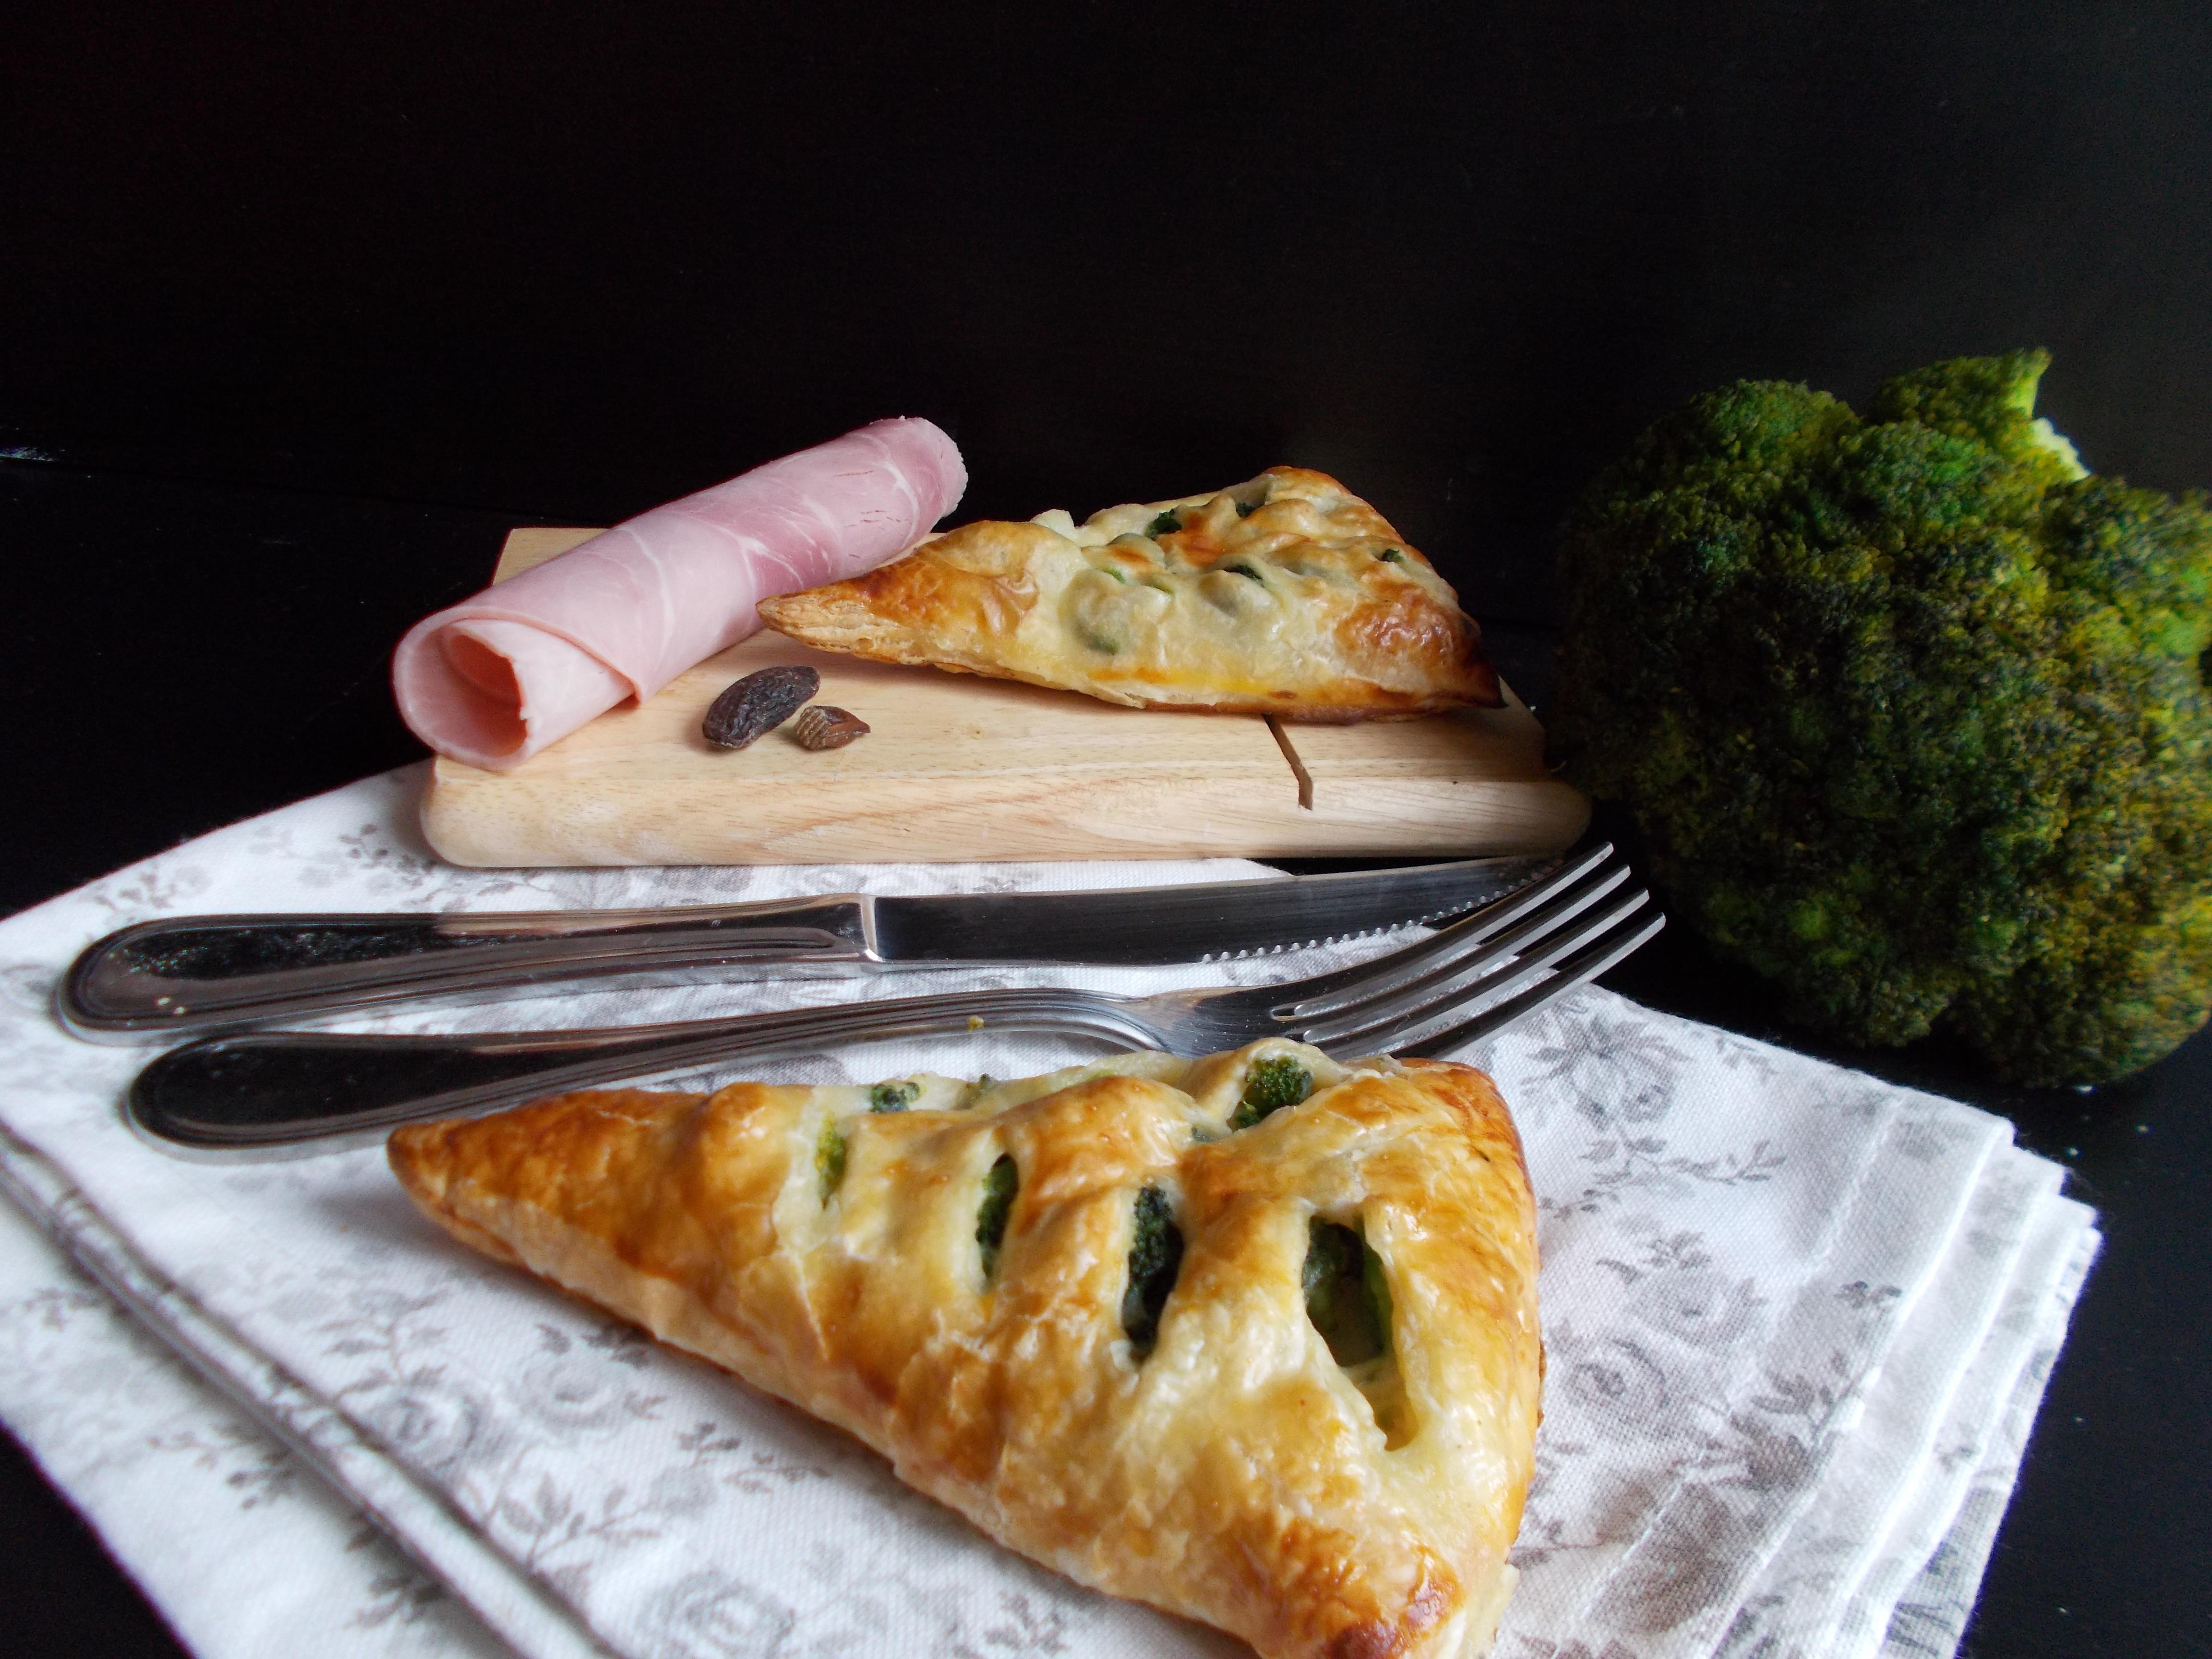 Friand au brocolis, Gabietou et fève tonka